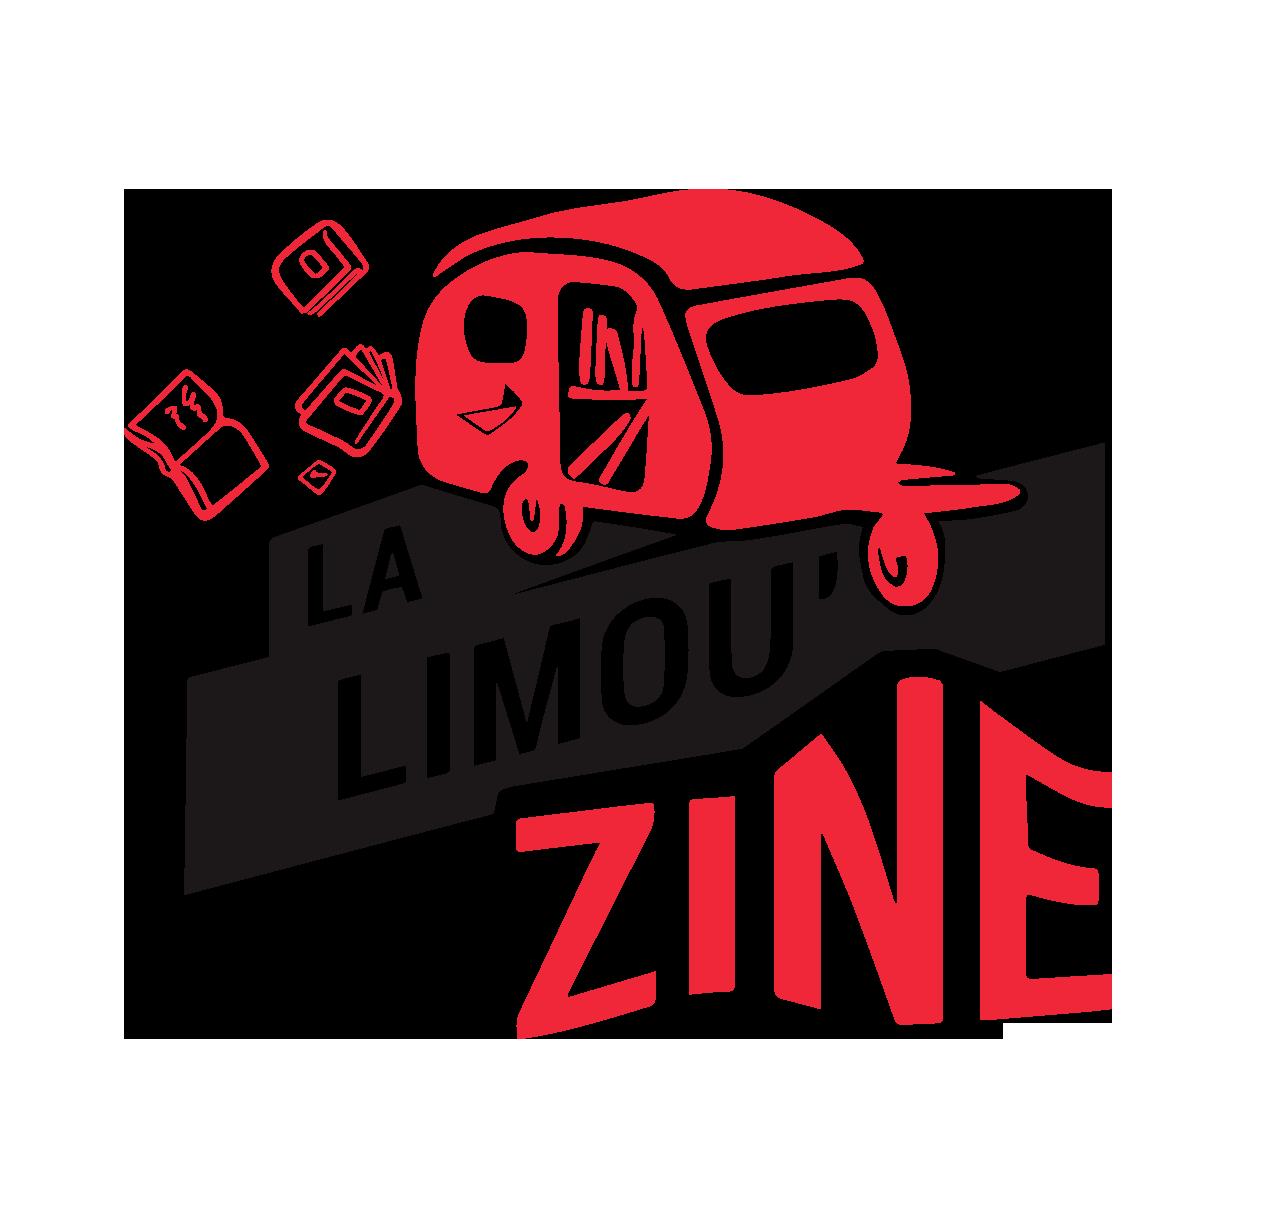 La Limou'Zine La Limou'Zine